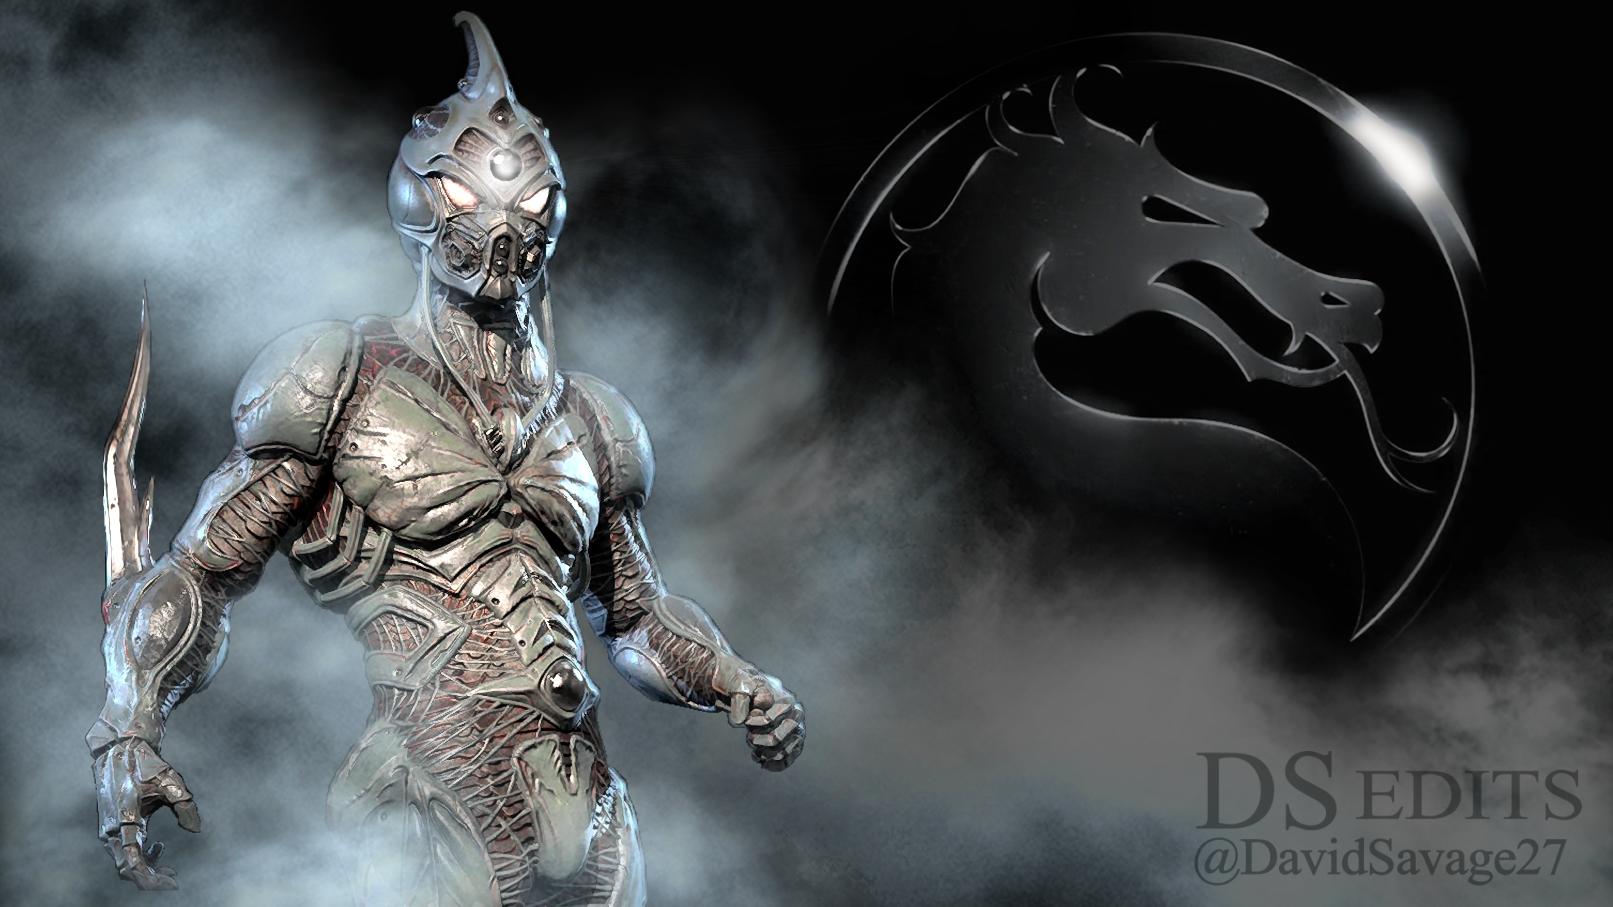 Mortal Kombat X Guyver by ultimate savage 1613x907